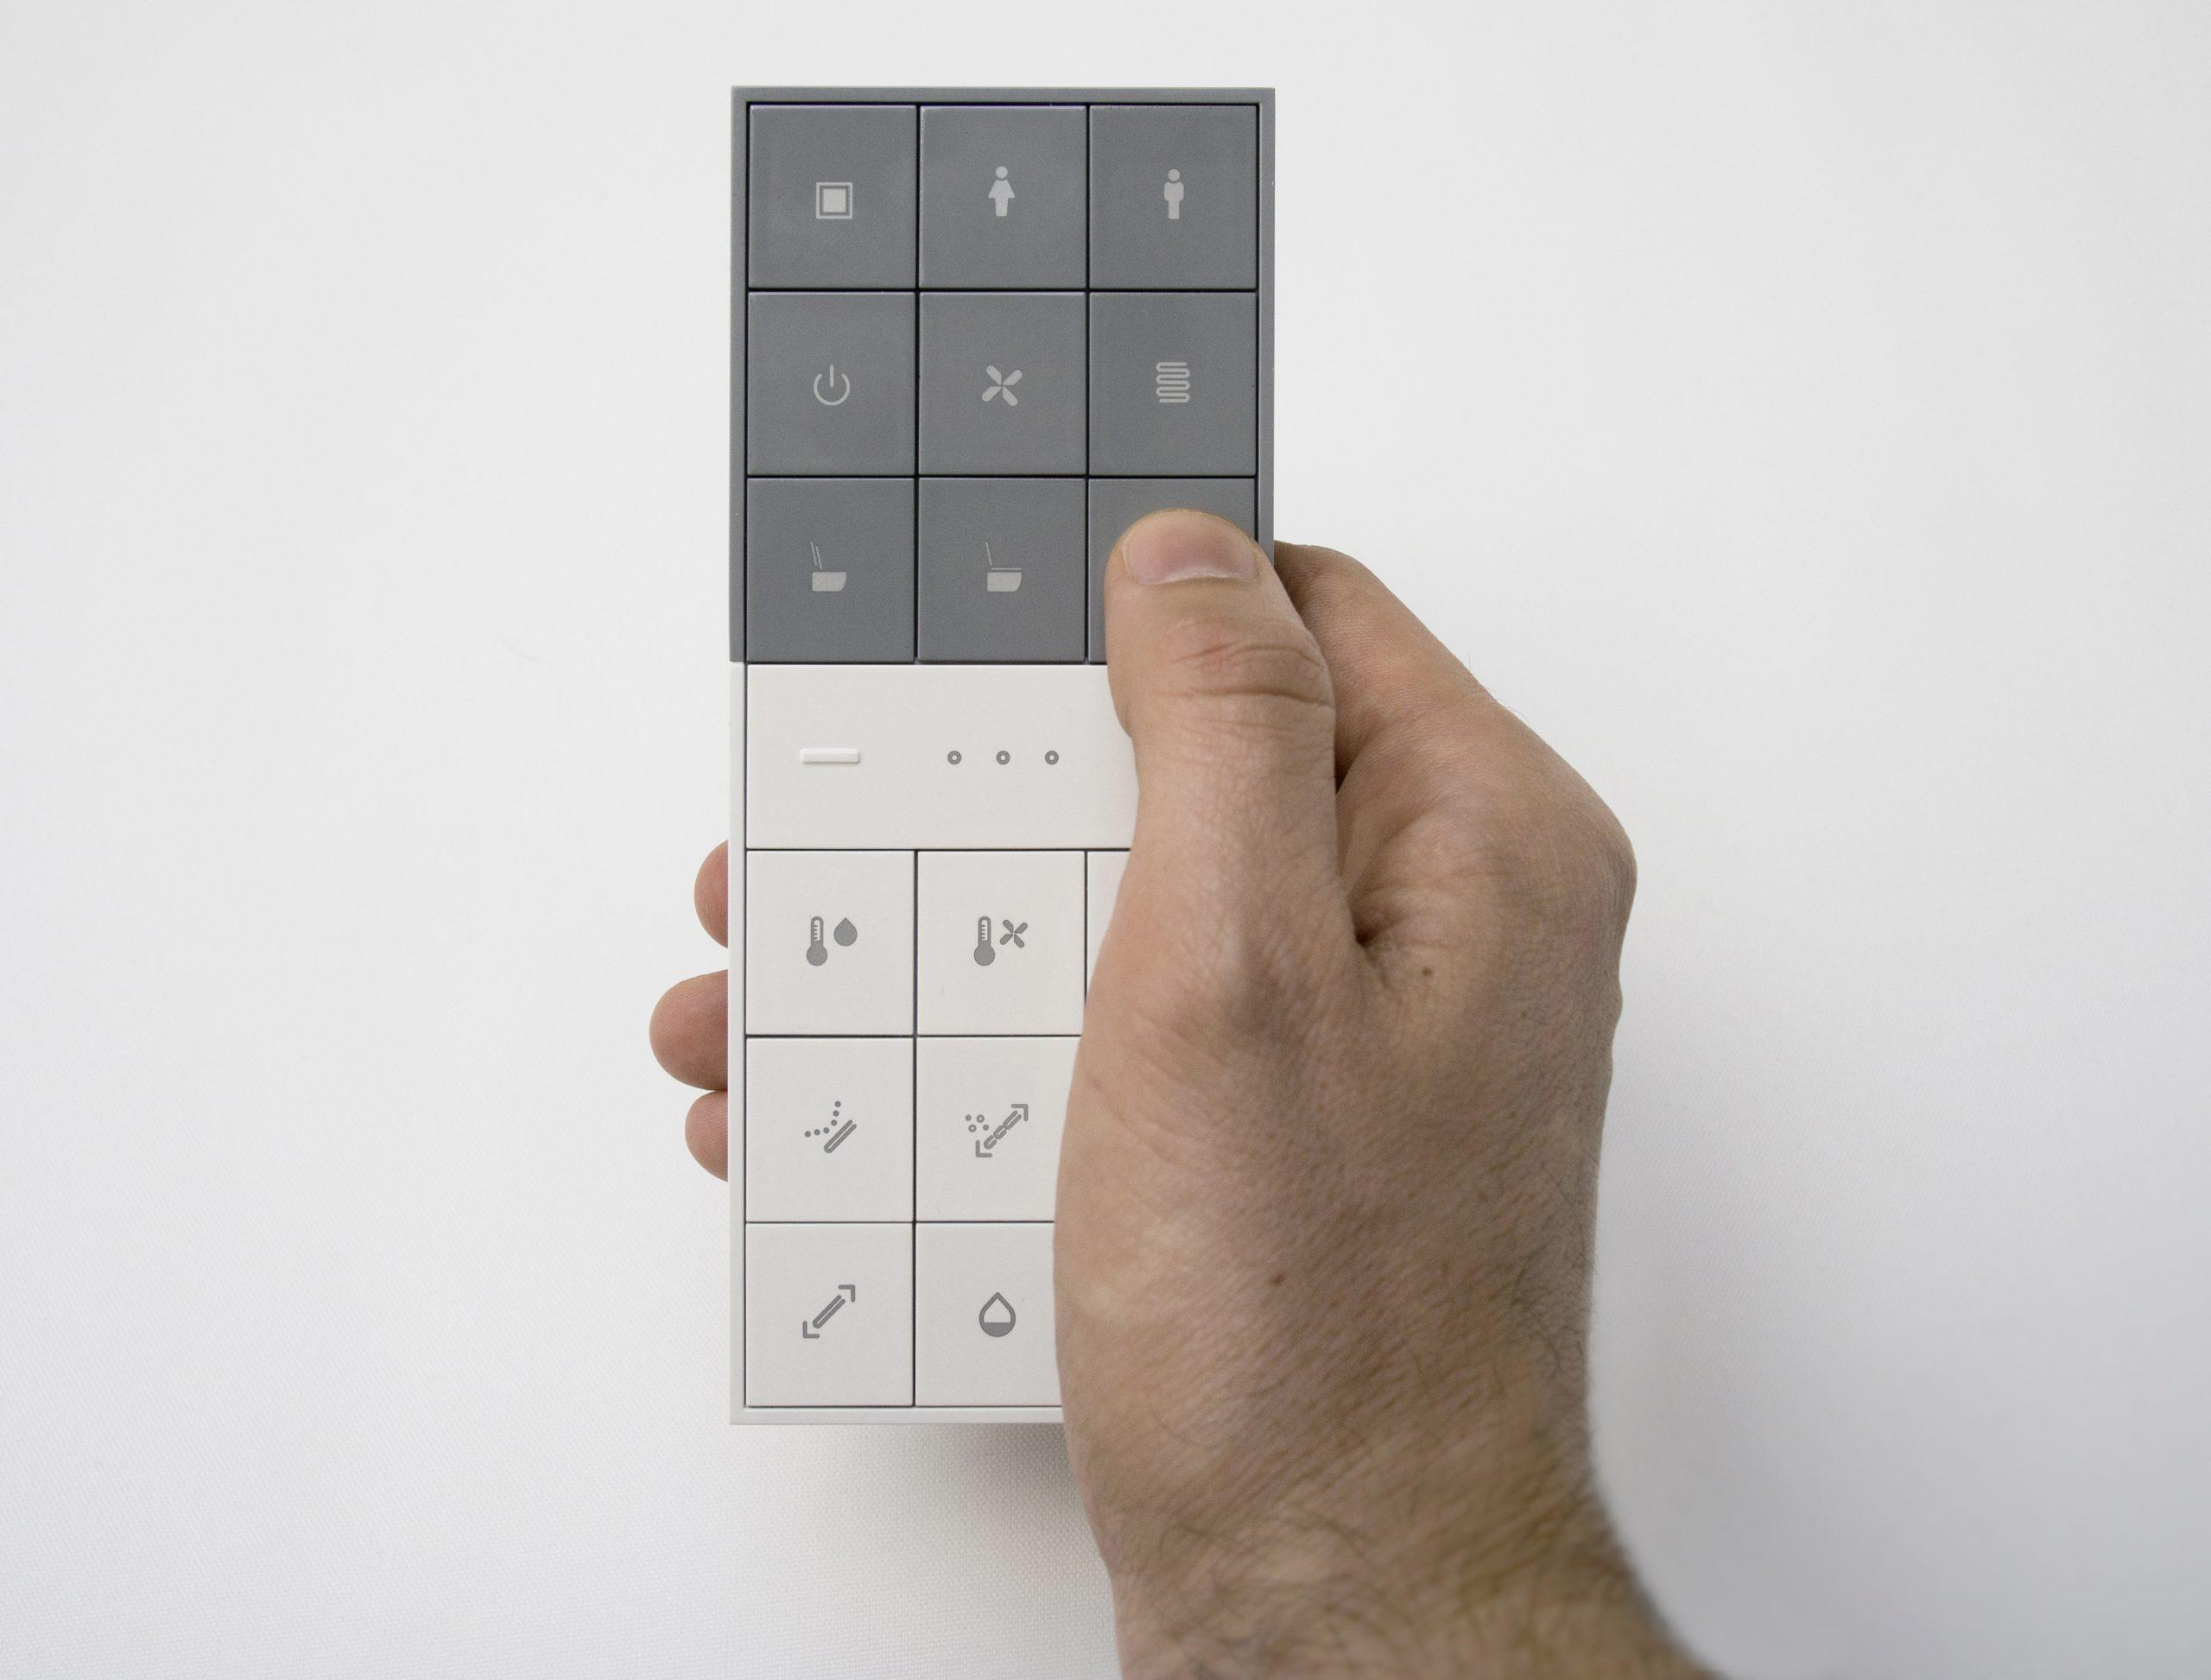 ViClean remote control series designed by Debiasi Sandri for Villeroy & Boch